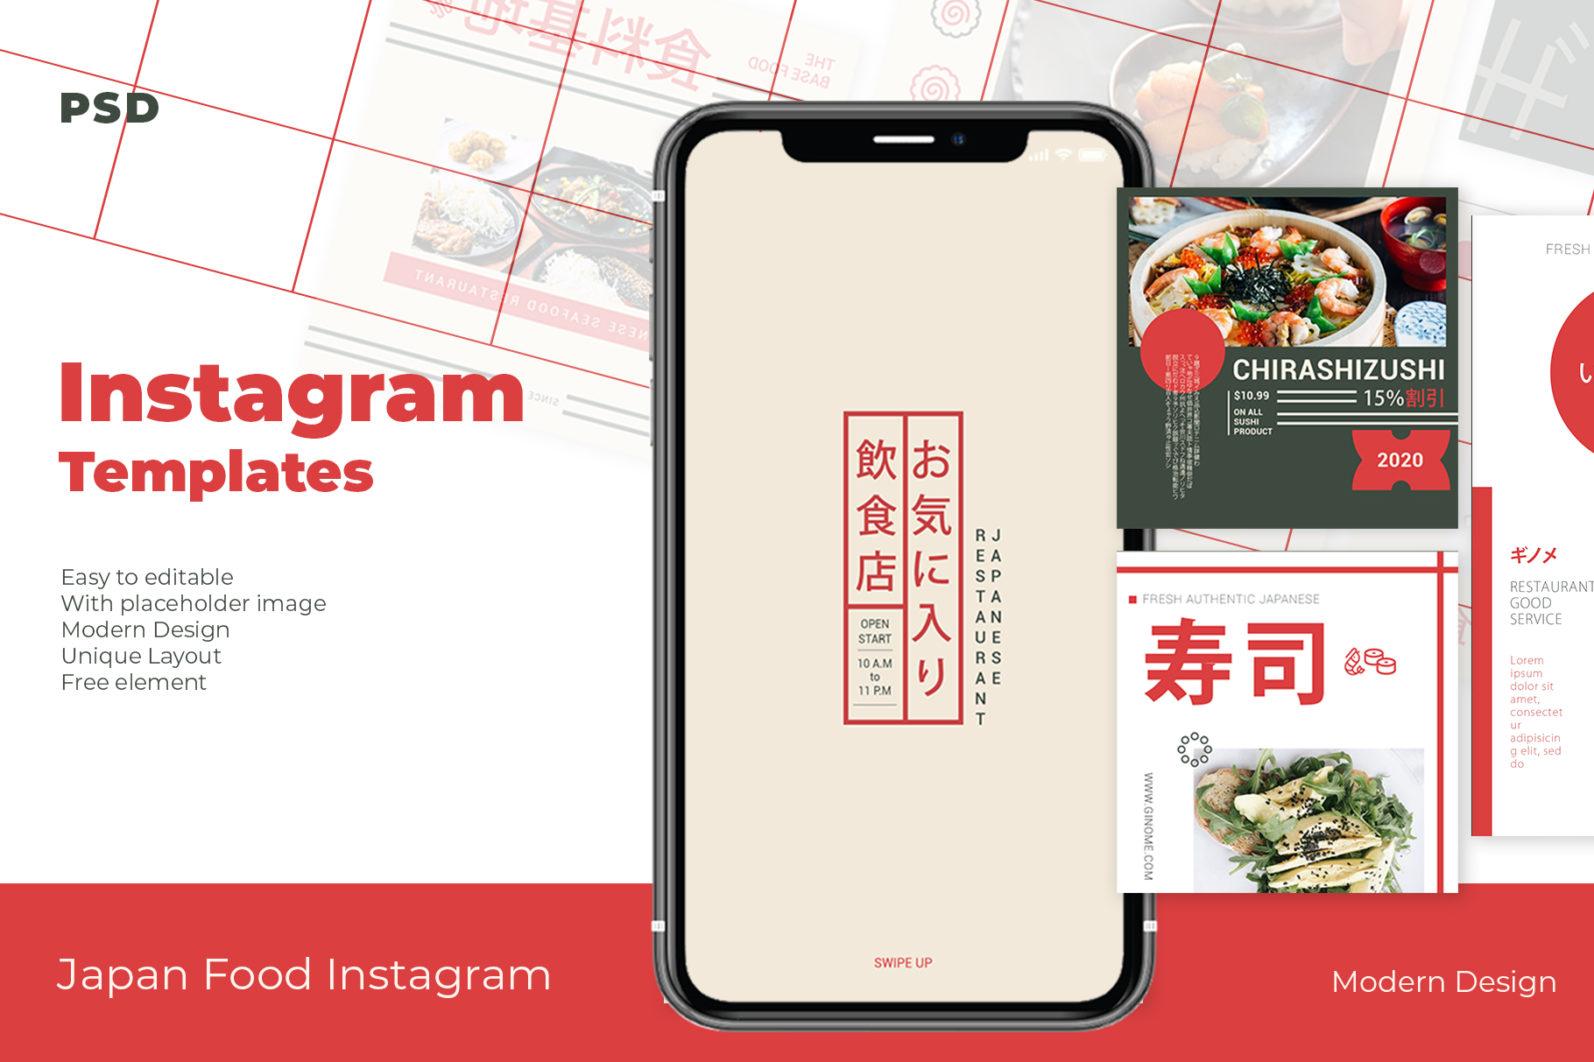 Japan Food Instagram Templates - new mockuppArtboard 1 -